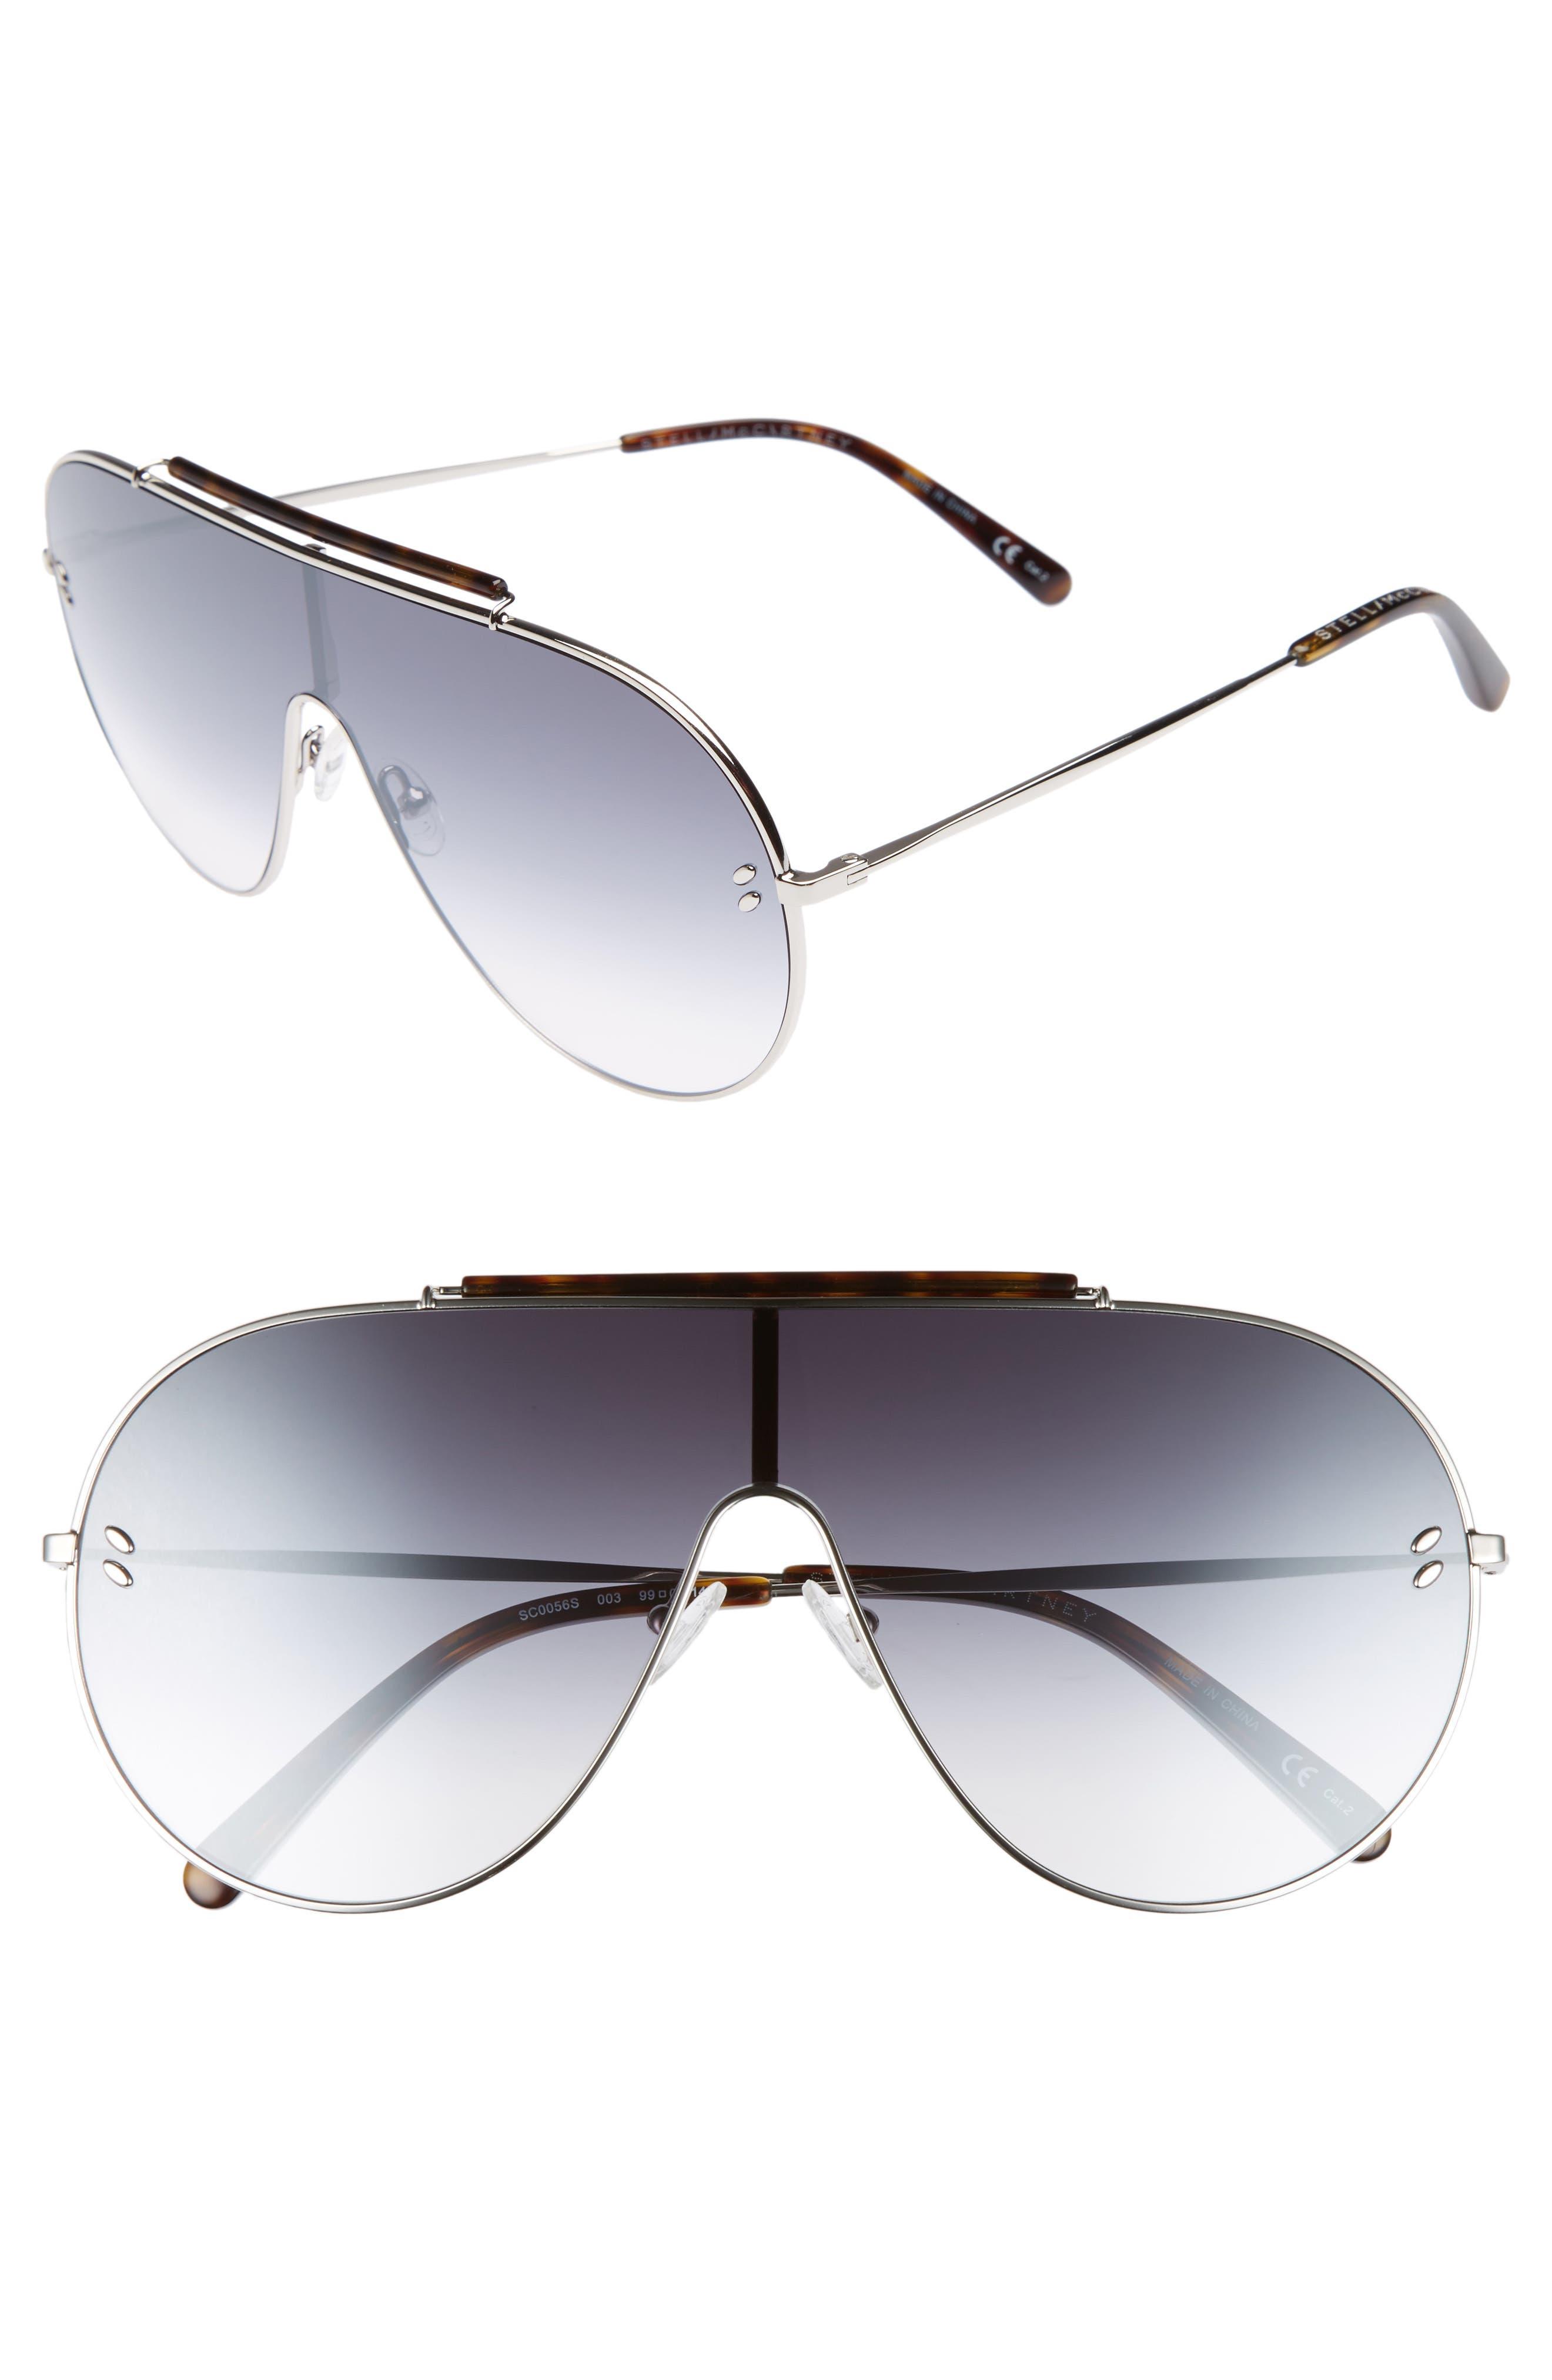 65mm Shield Sunglasses,                             Main thumbnail 1, color,